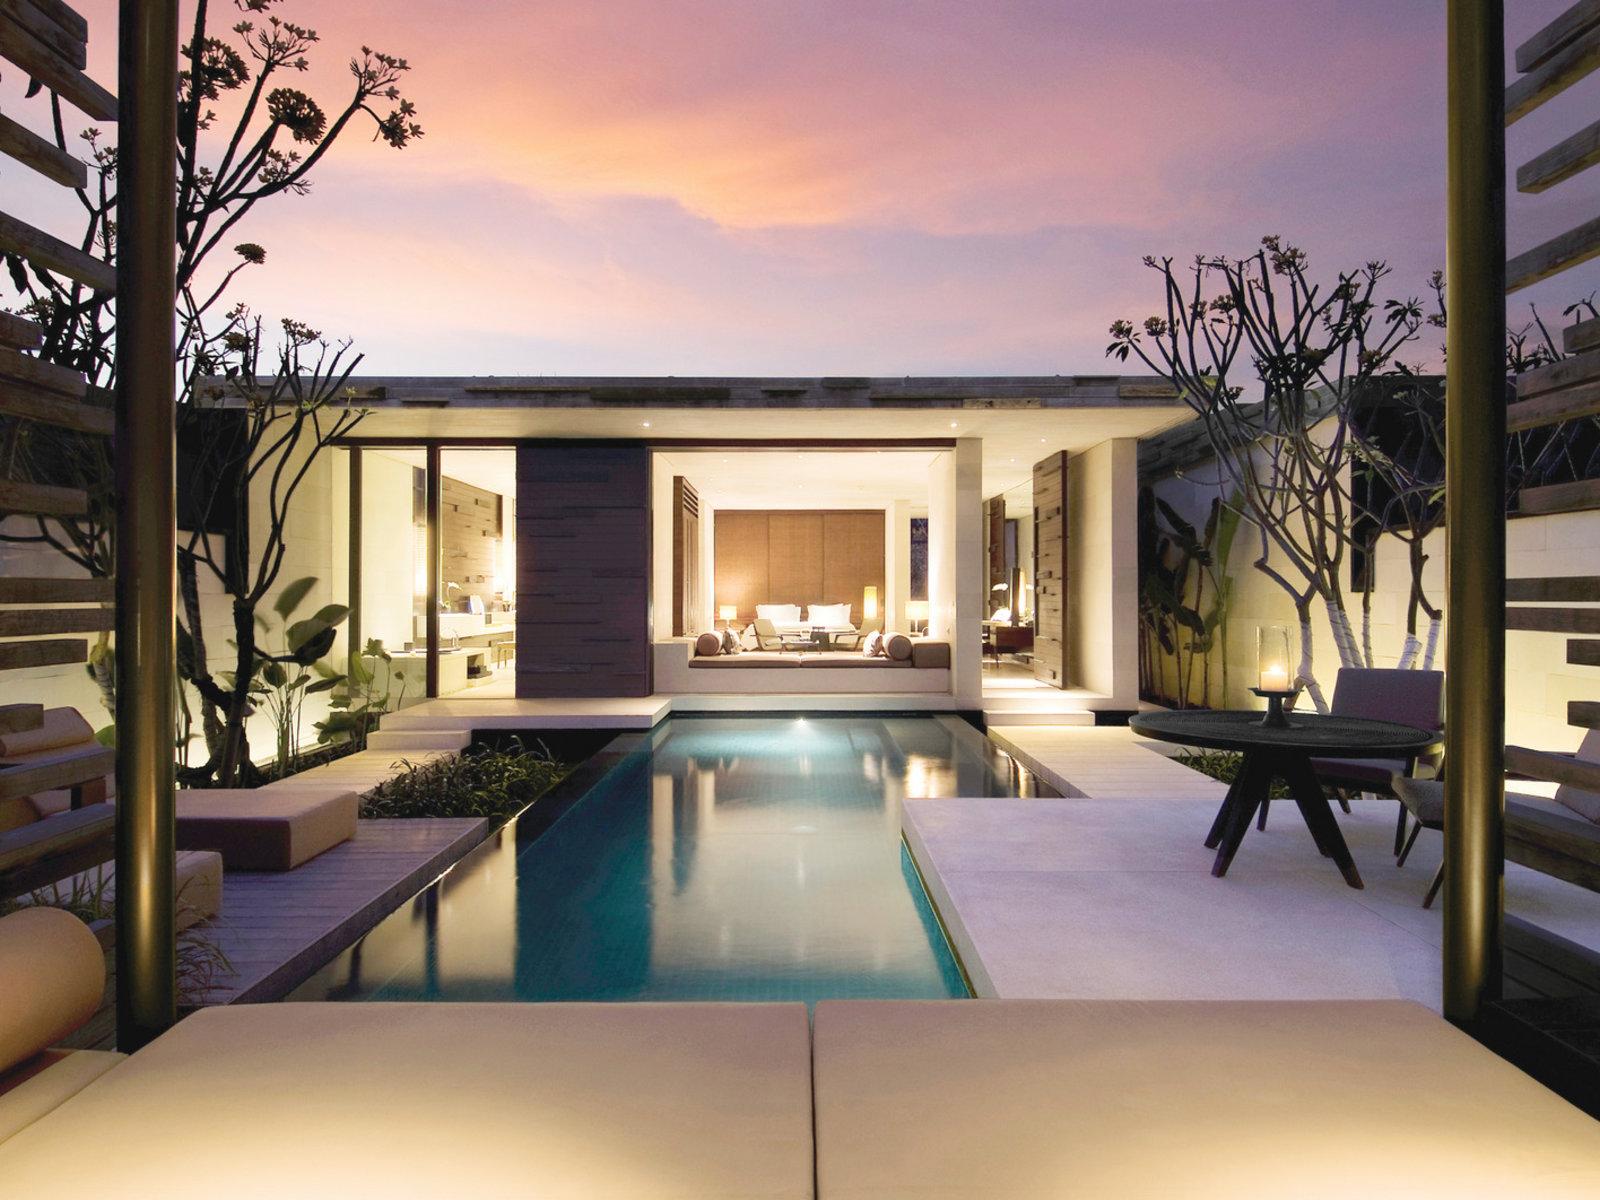 Wohnbeispiel One Bedroom Pool Villa